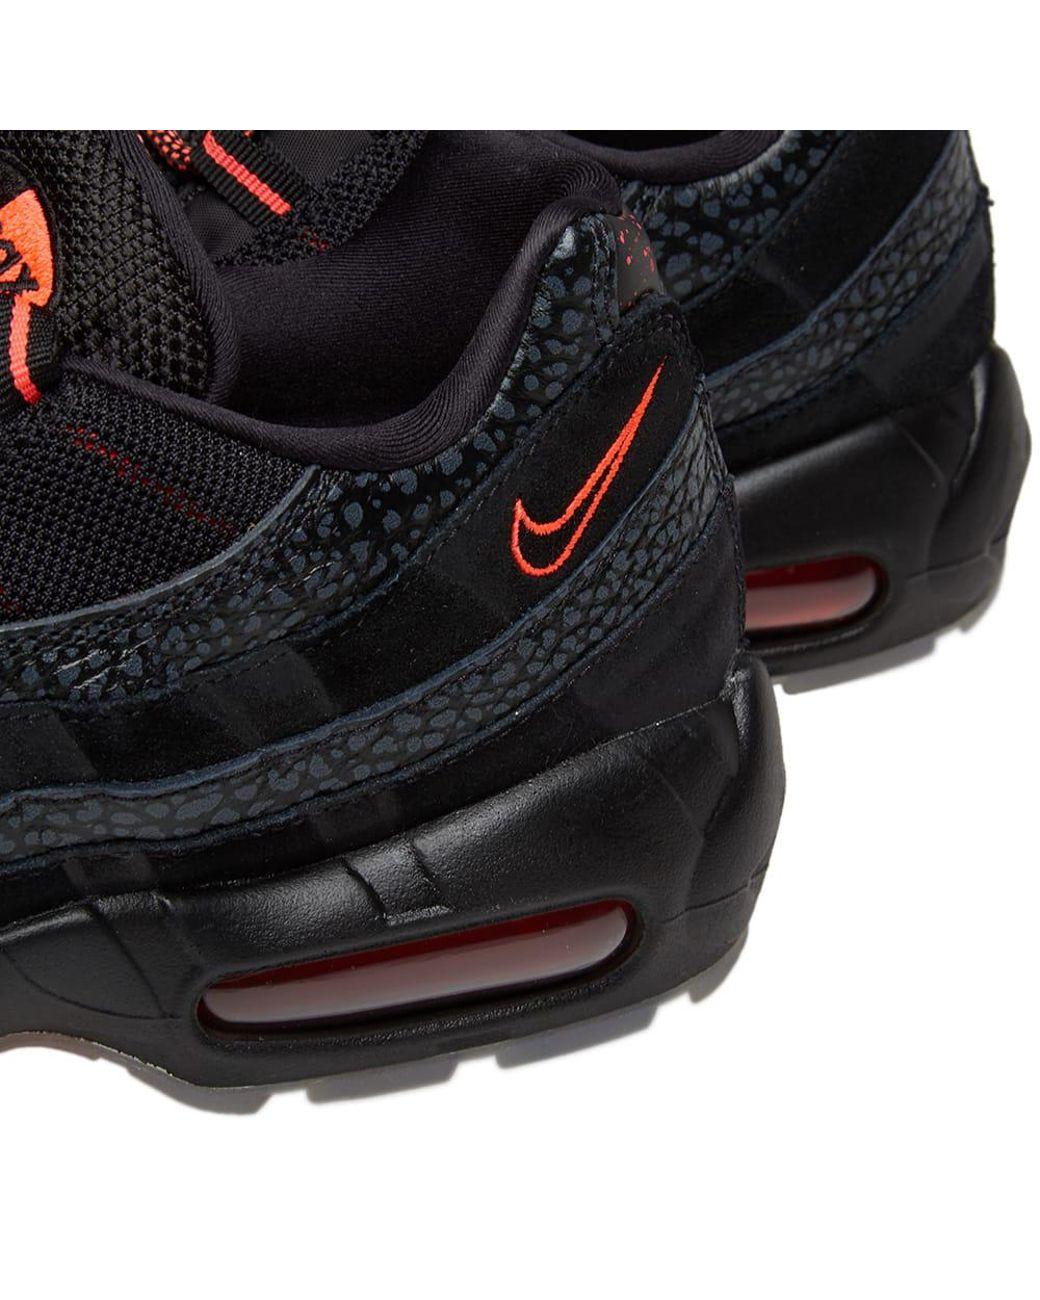 Nike Air Max 95 Greatest Hits Pack